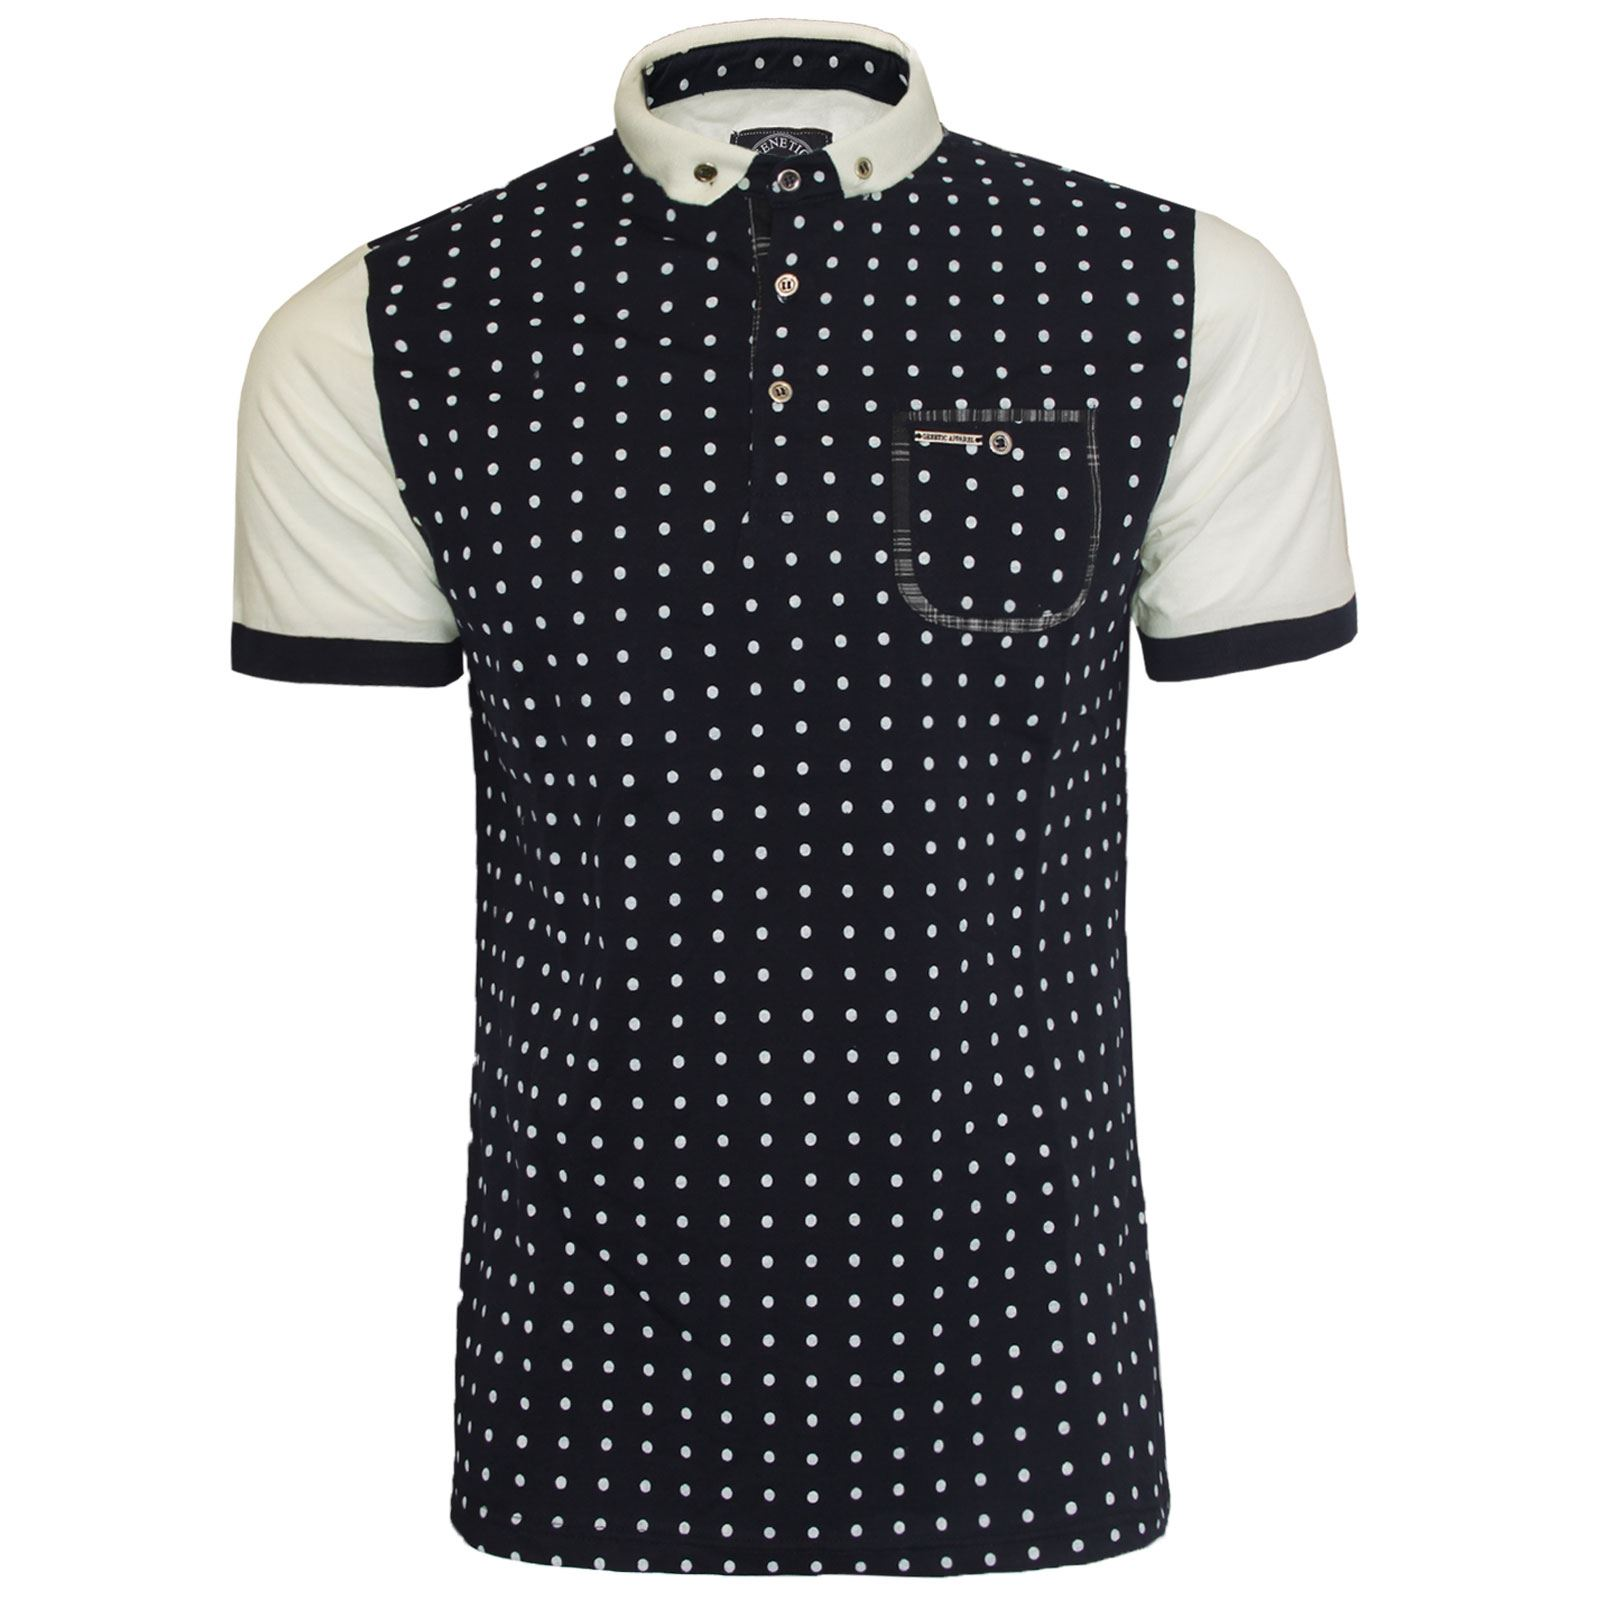 Design t shirt colar - New Mens Short Sleeve Polka Design Smart Collar